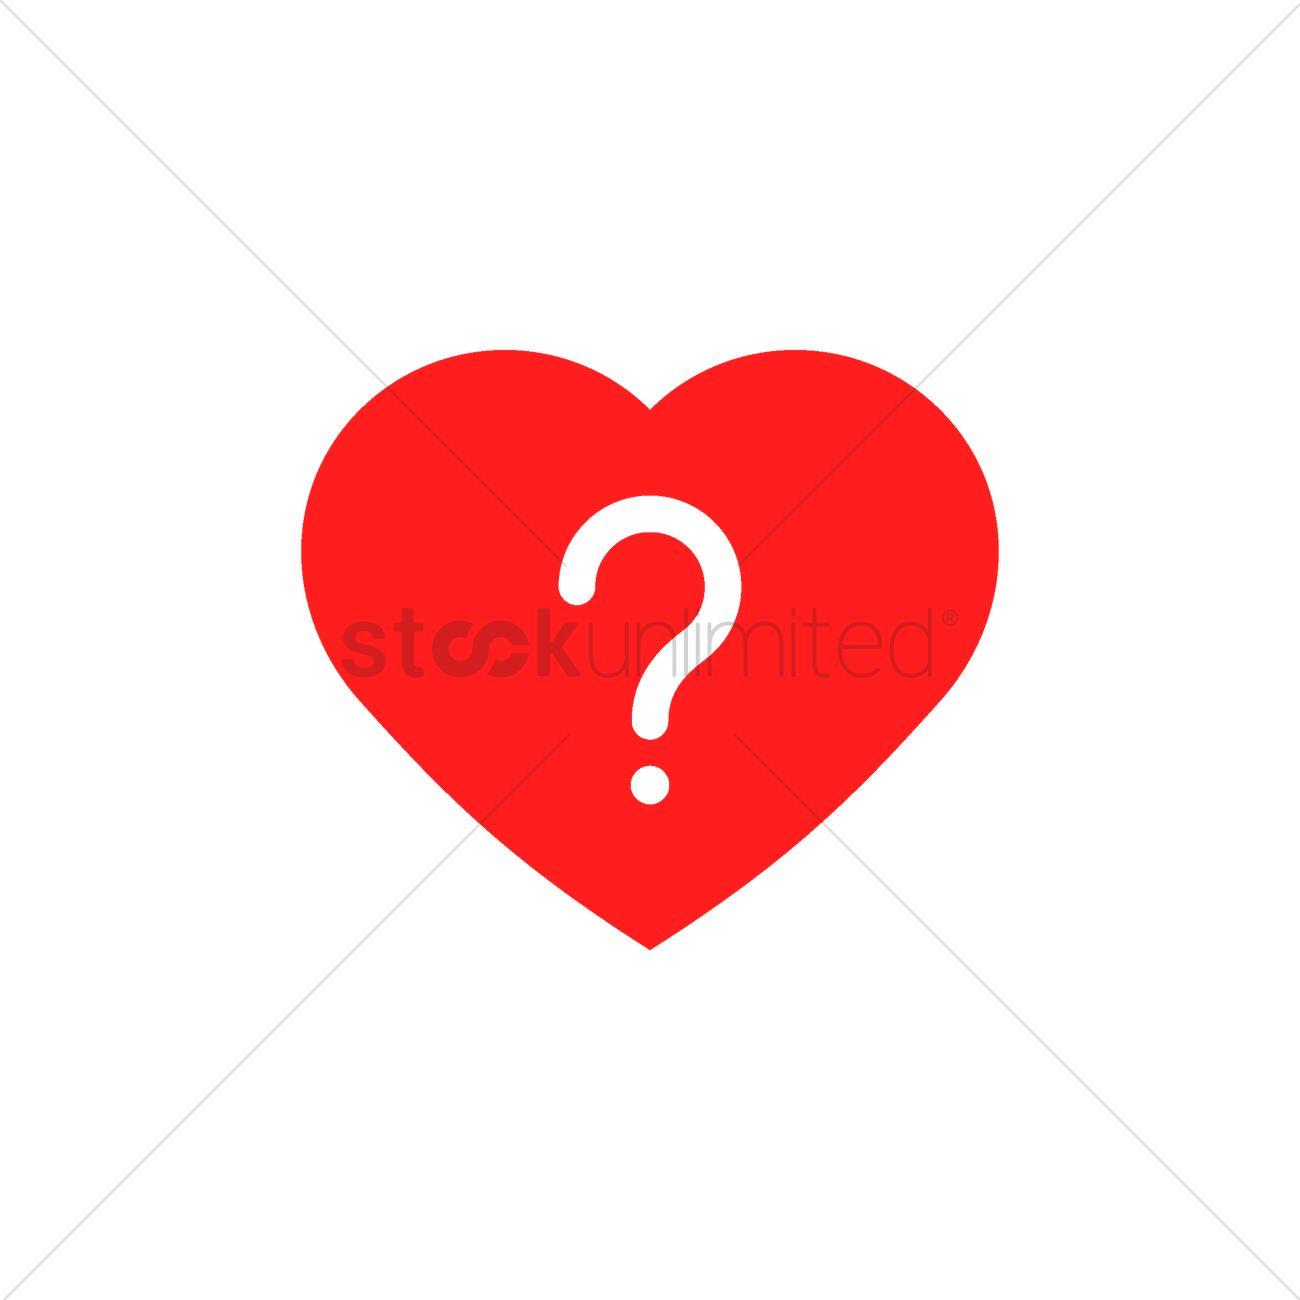 Heart Question – Fashion design images